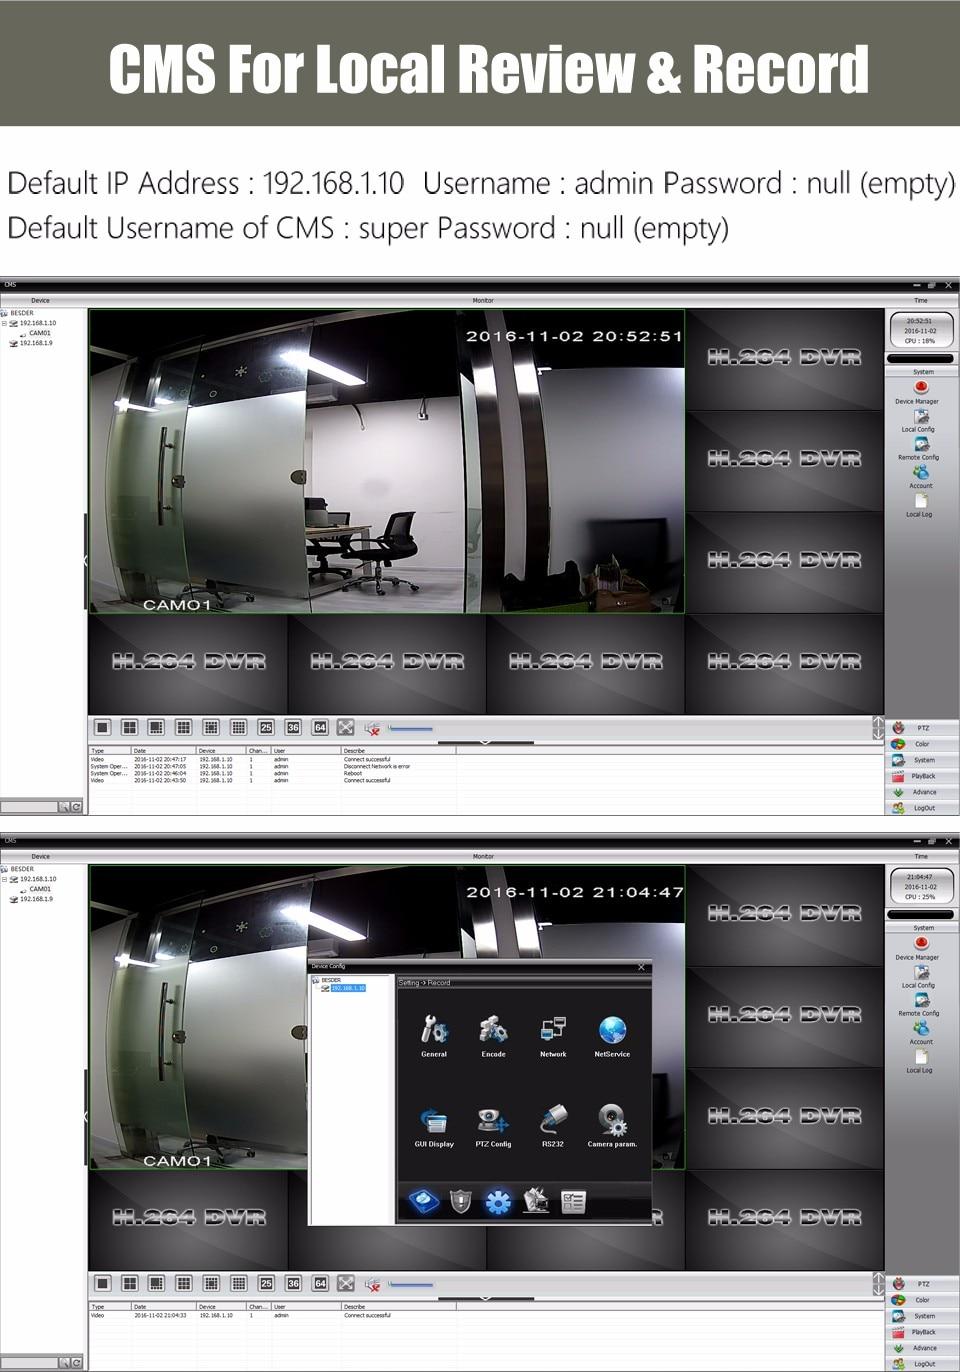 Hbfa9edca19784413b6f45e96d499147fp MISECU Super HD 5MP 4MP 2MP Surveillance IP POE Camera 1080P Audio Microphone Dome Indoor Security Camera Email Push ONVIF P2P